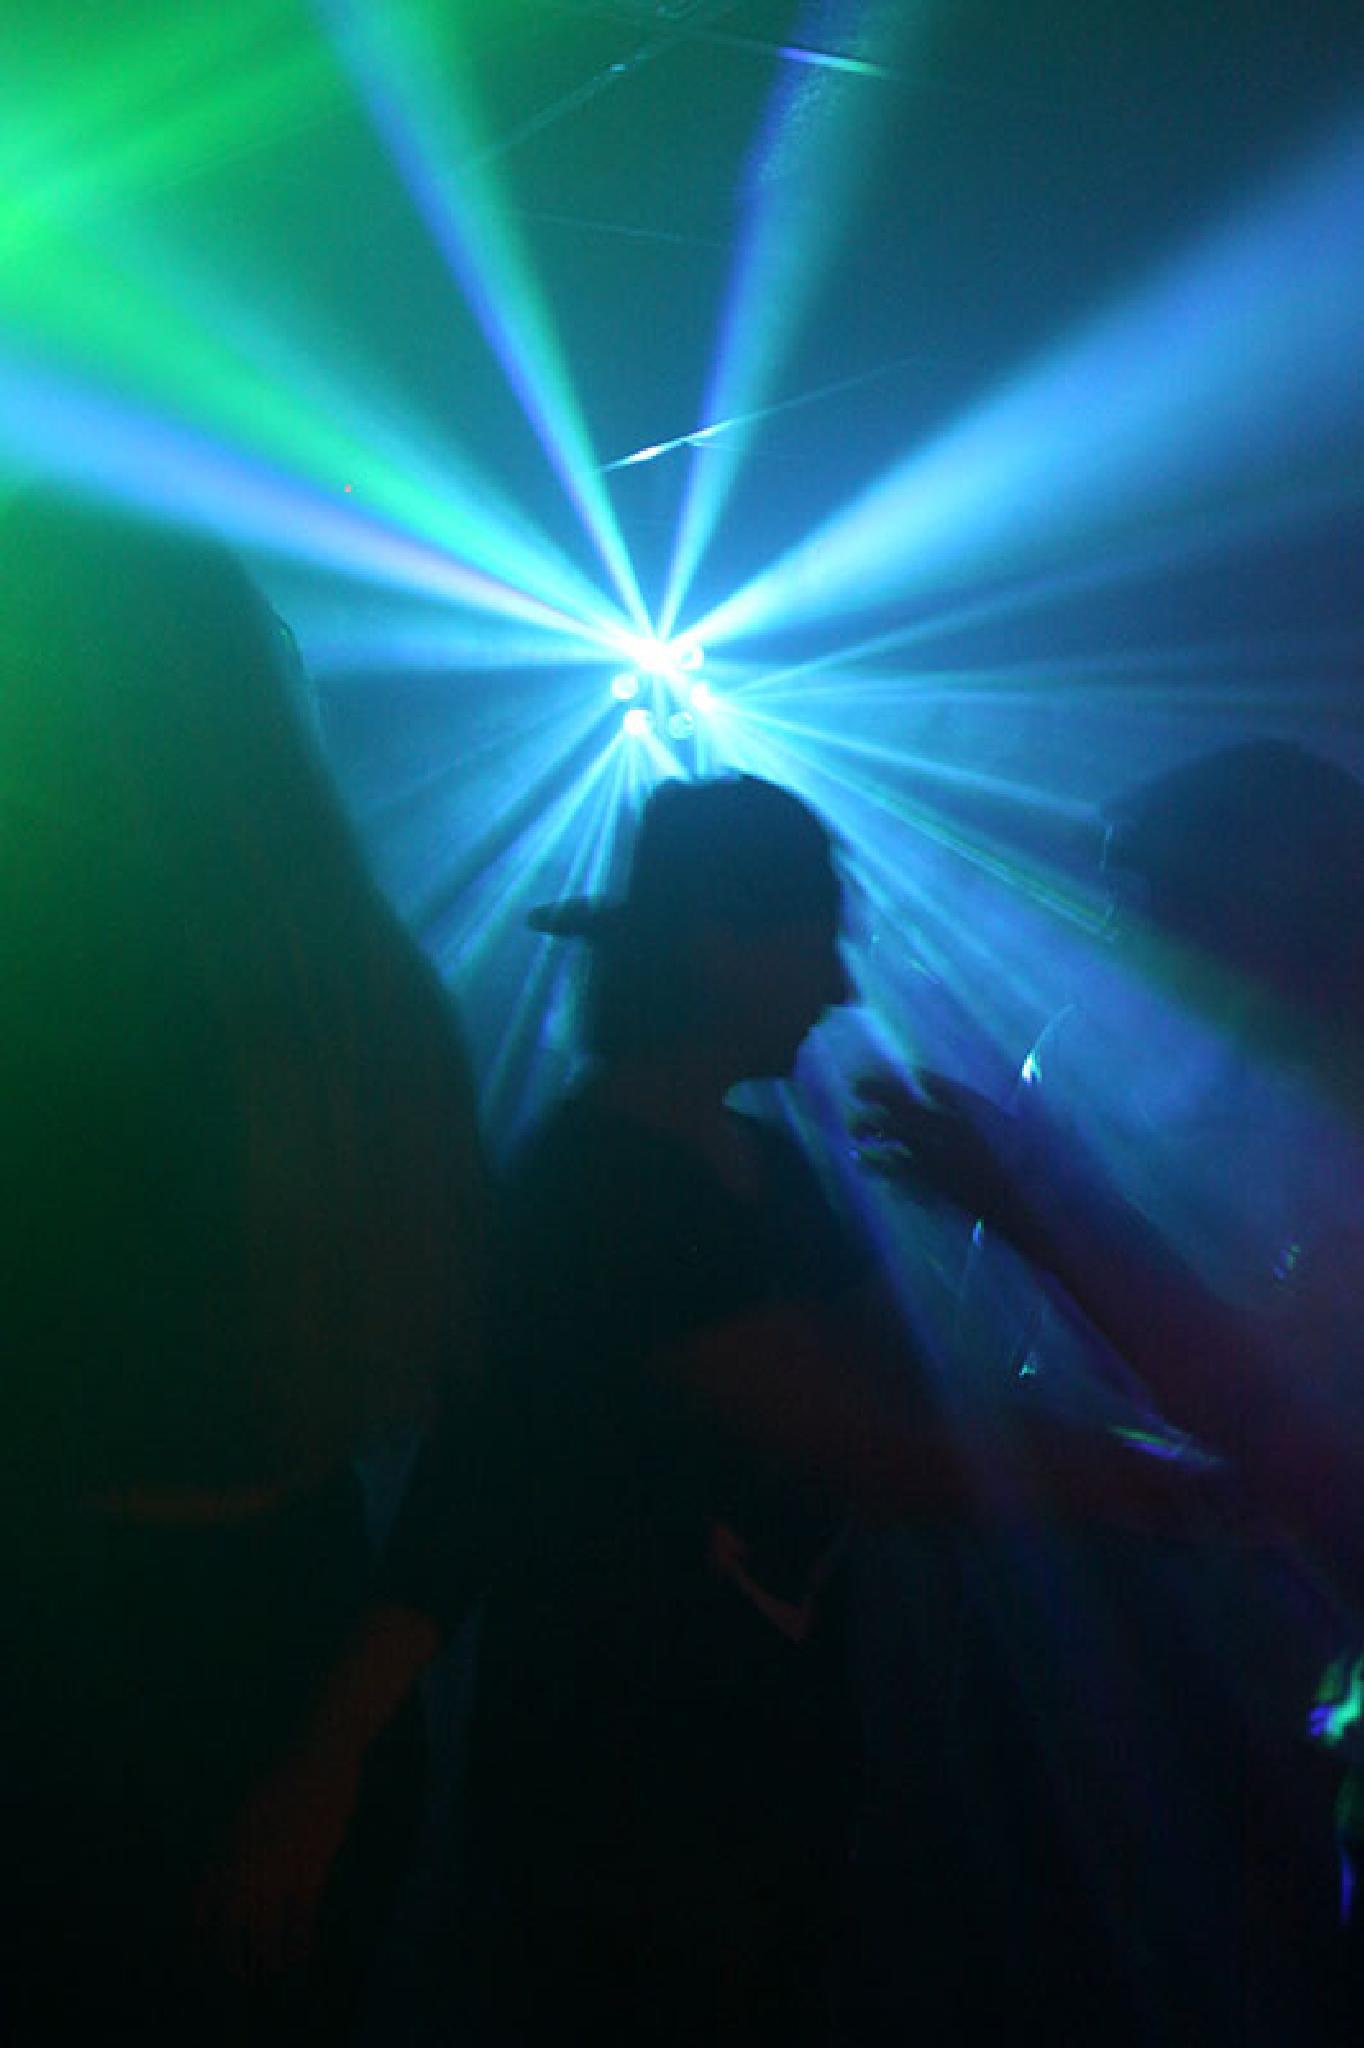 Disco light by karljohan.sandberg